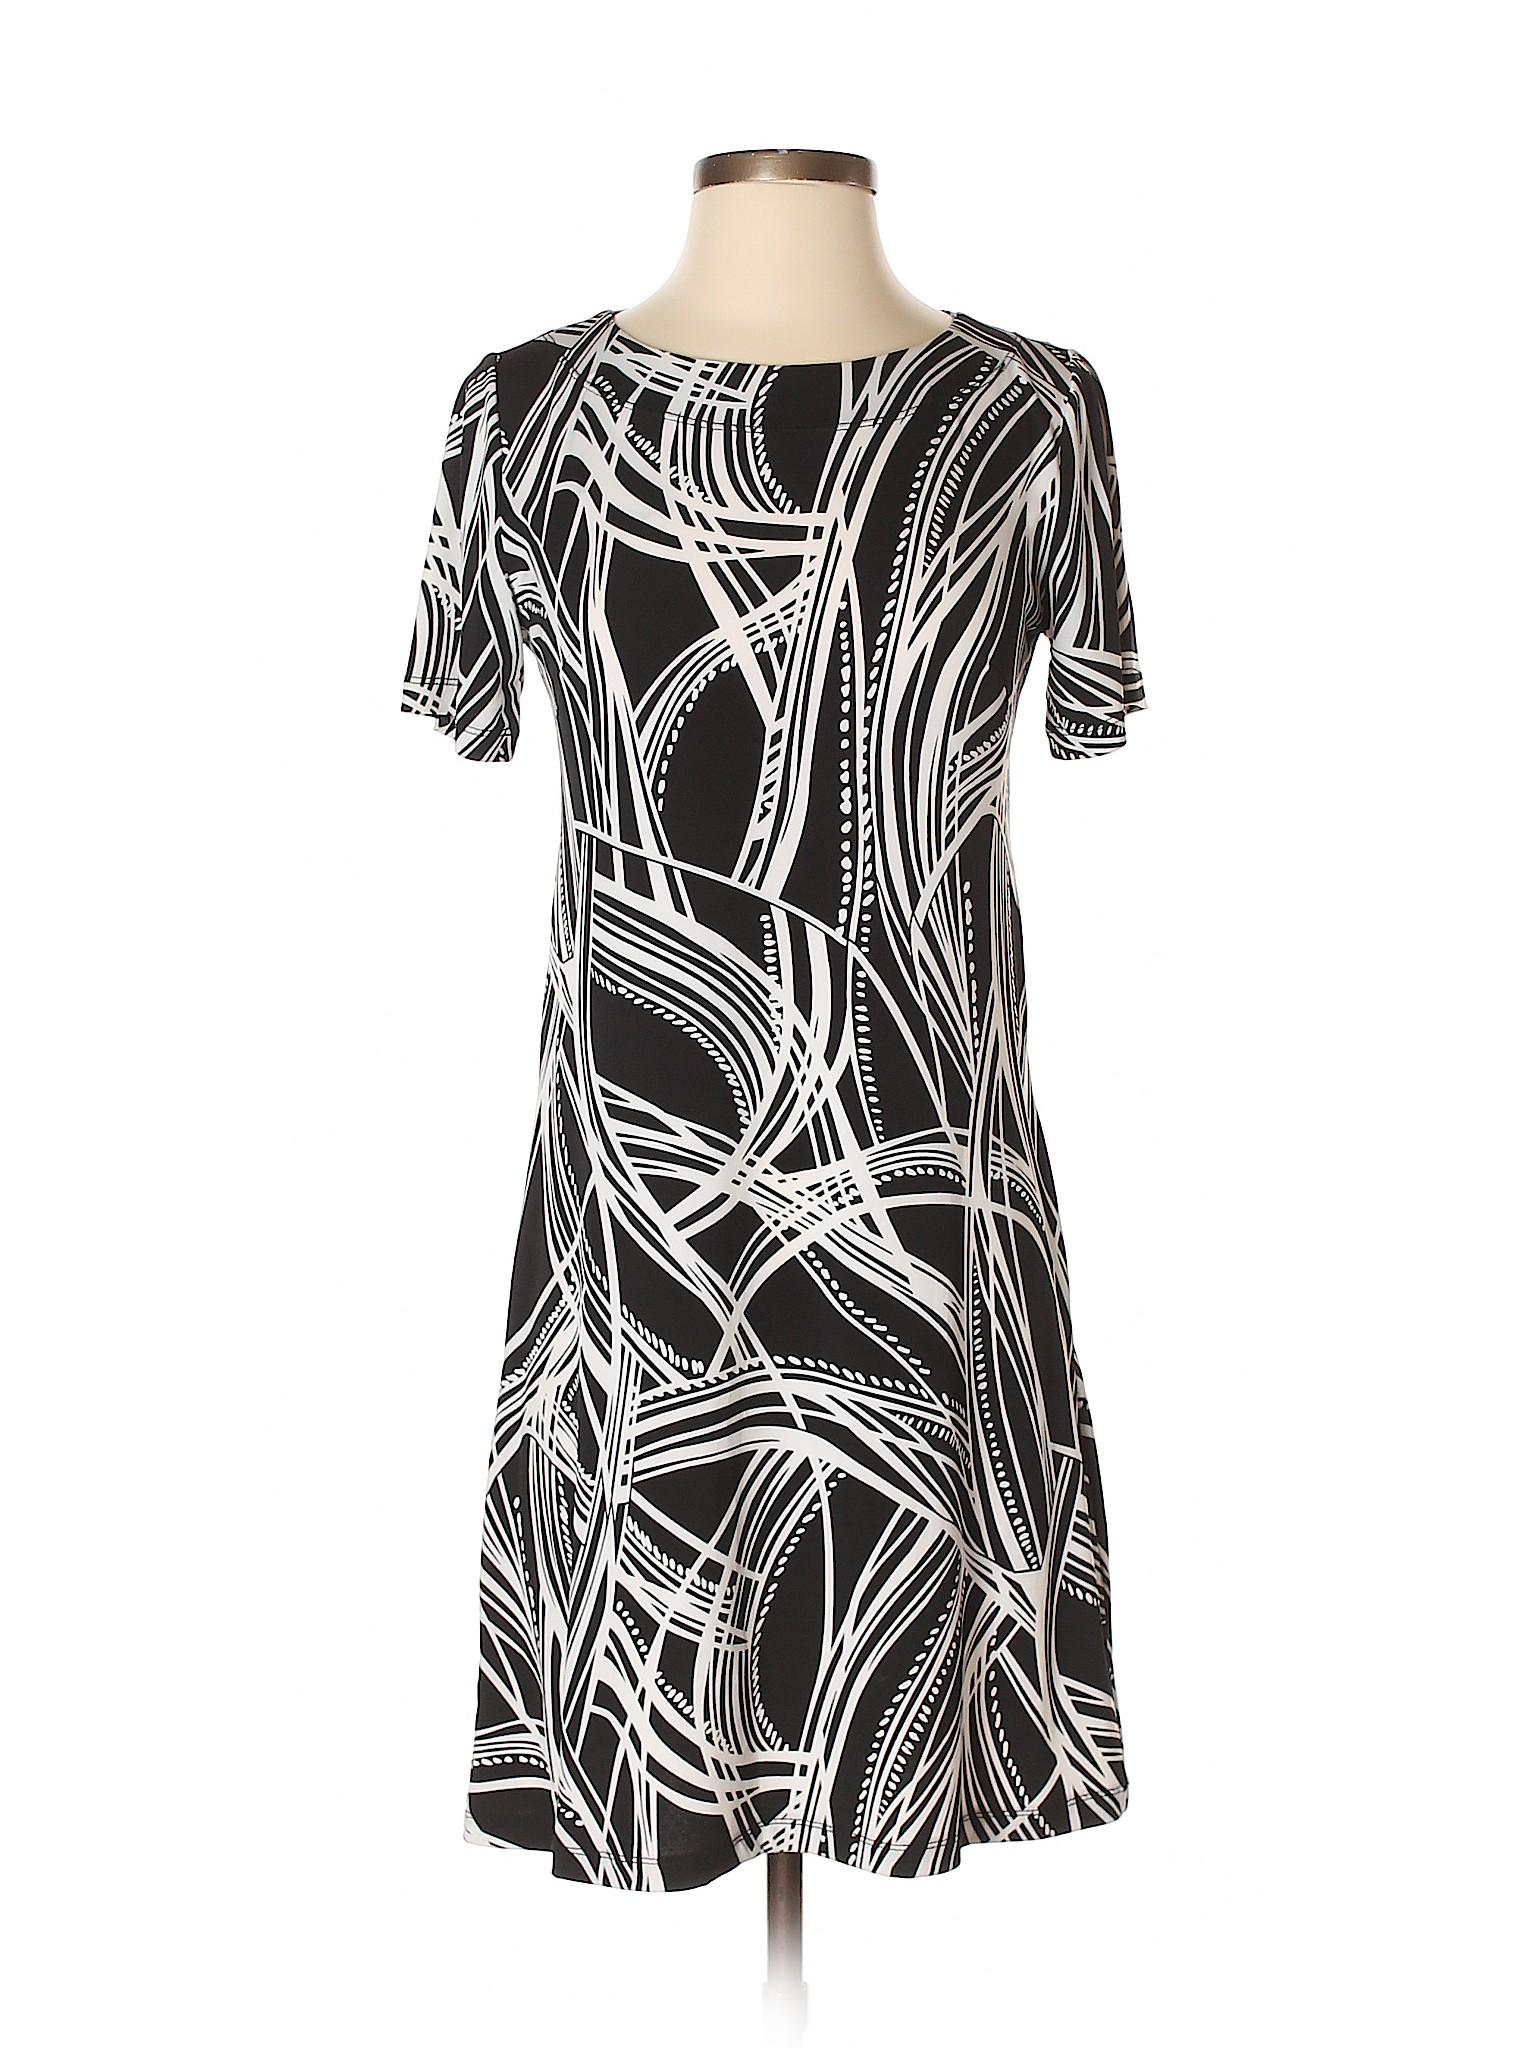 Casual Boutique Boutique Winter Dressbarn Dress Dressbarn Winter nRURqgrX6